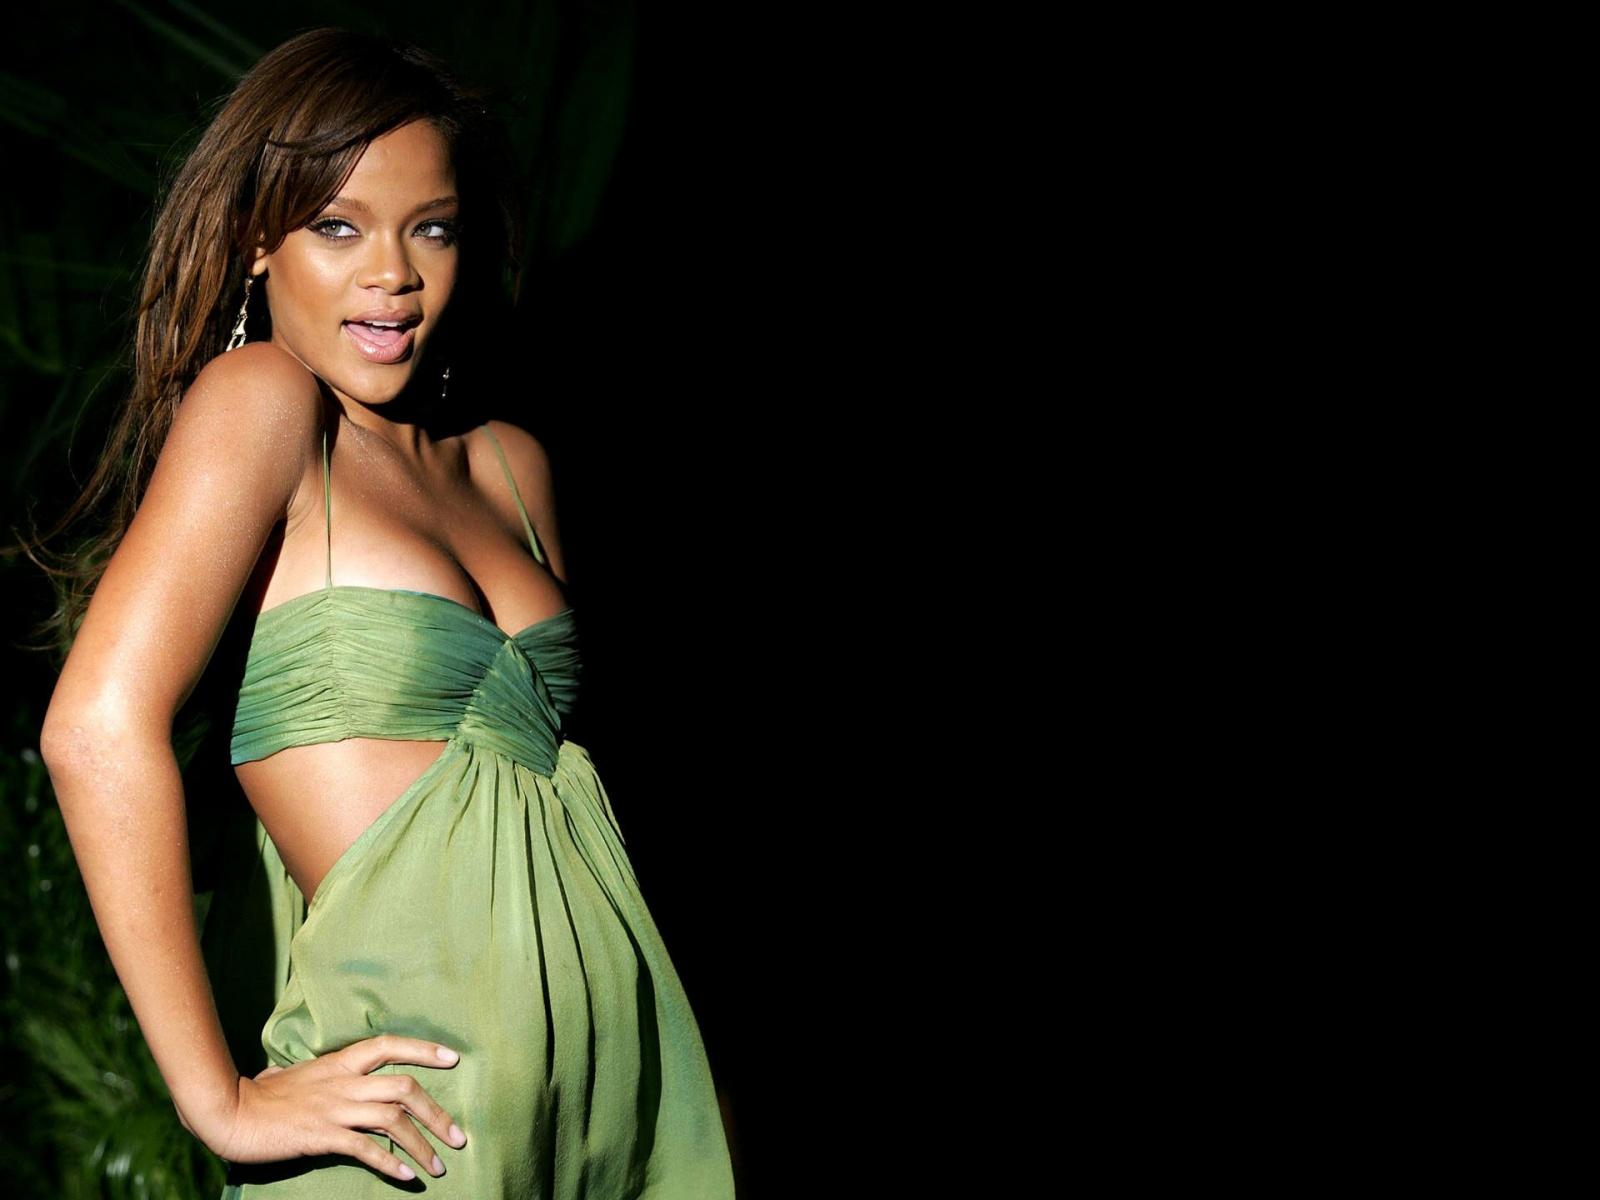 http://2.bp.blogspot.com/-xJzF7Vvl3b0/TyajsORbUkI/AAAAAAAAC6Y/MXuQvoMjml8/s1600/Rihanna-Hot-wallpapers-1.jpg